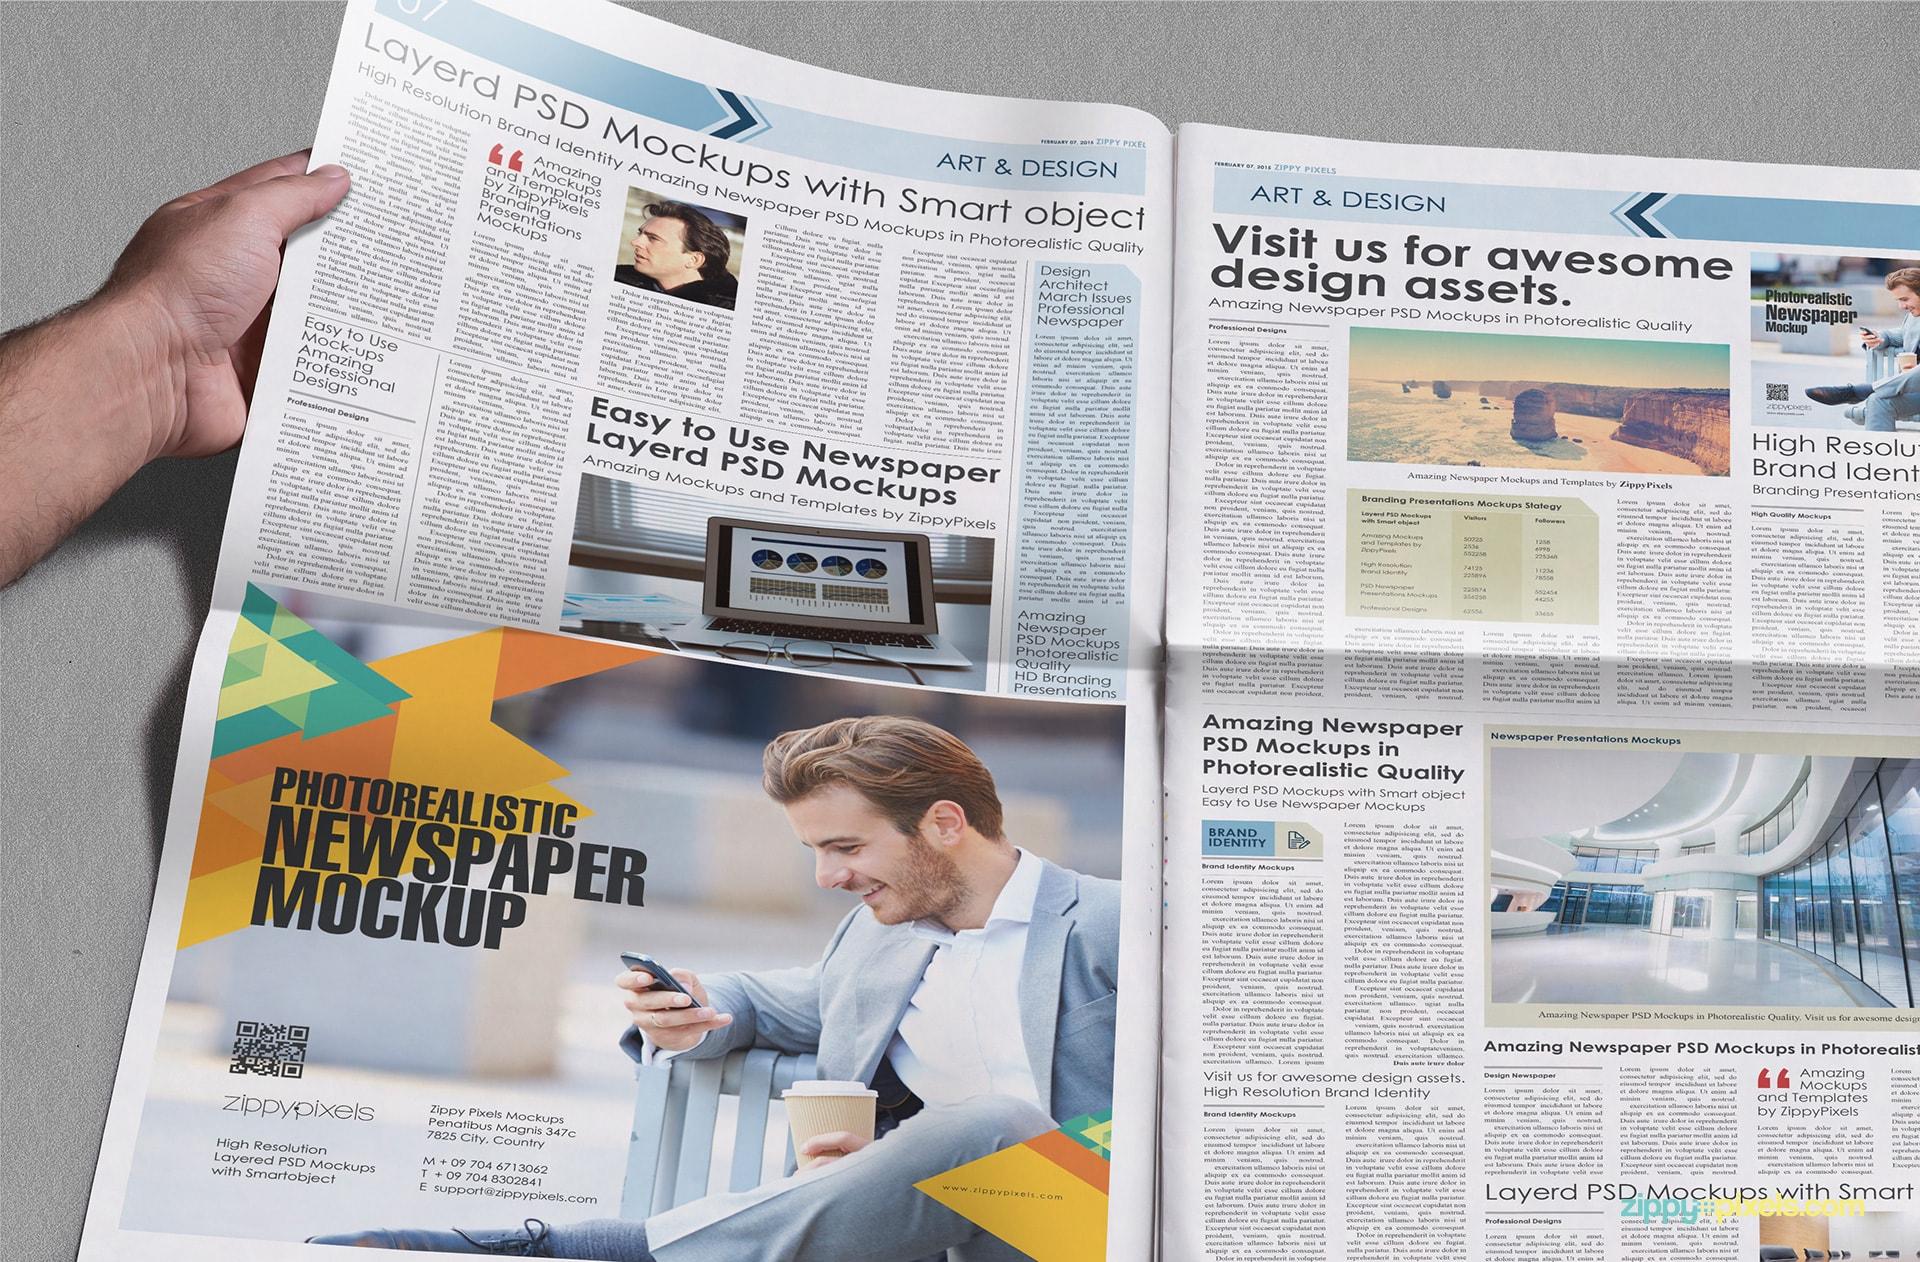 beautiful newspaper ad psd mockup zippypixels 7 additional mockups as bonus